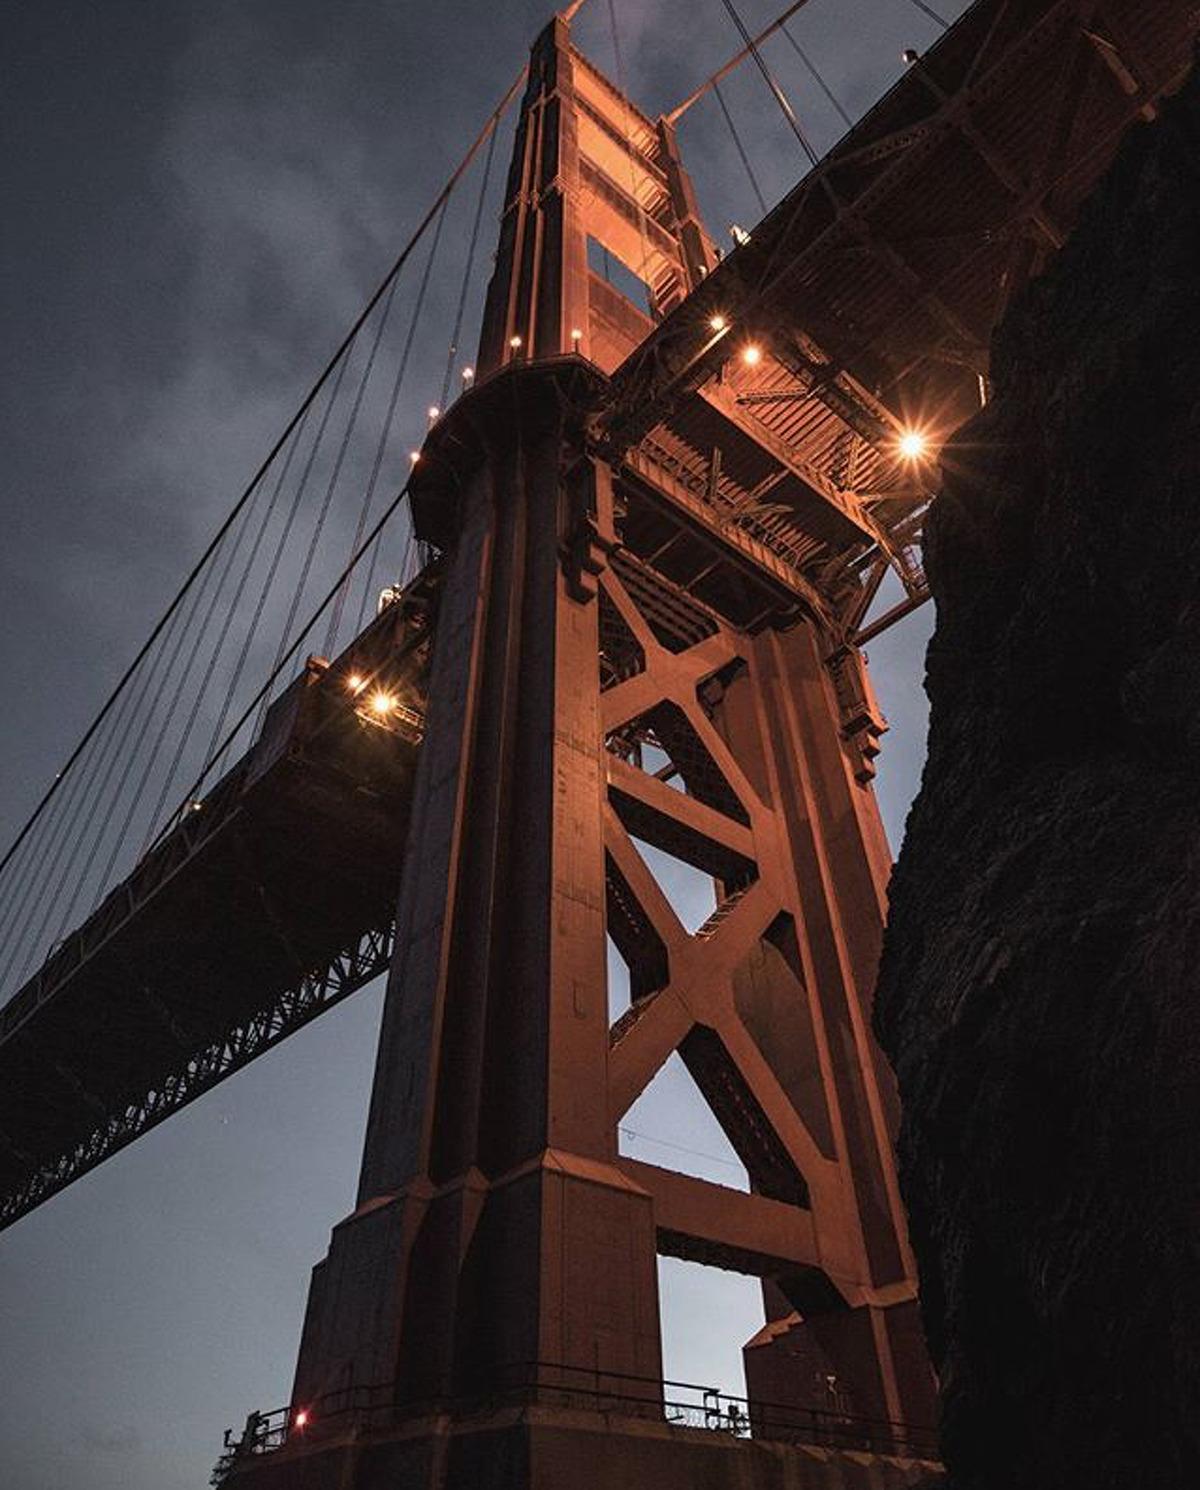 @_mikemcc makes the Golden Gate Bridge look like a goliath.